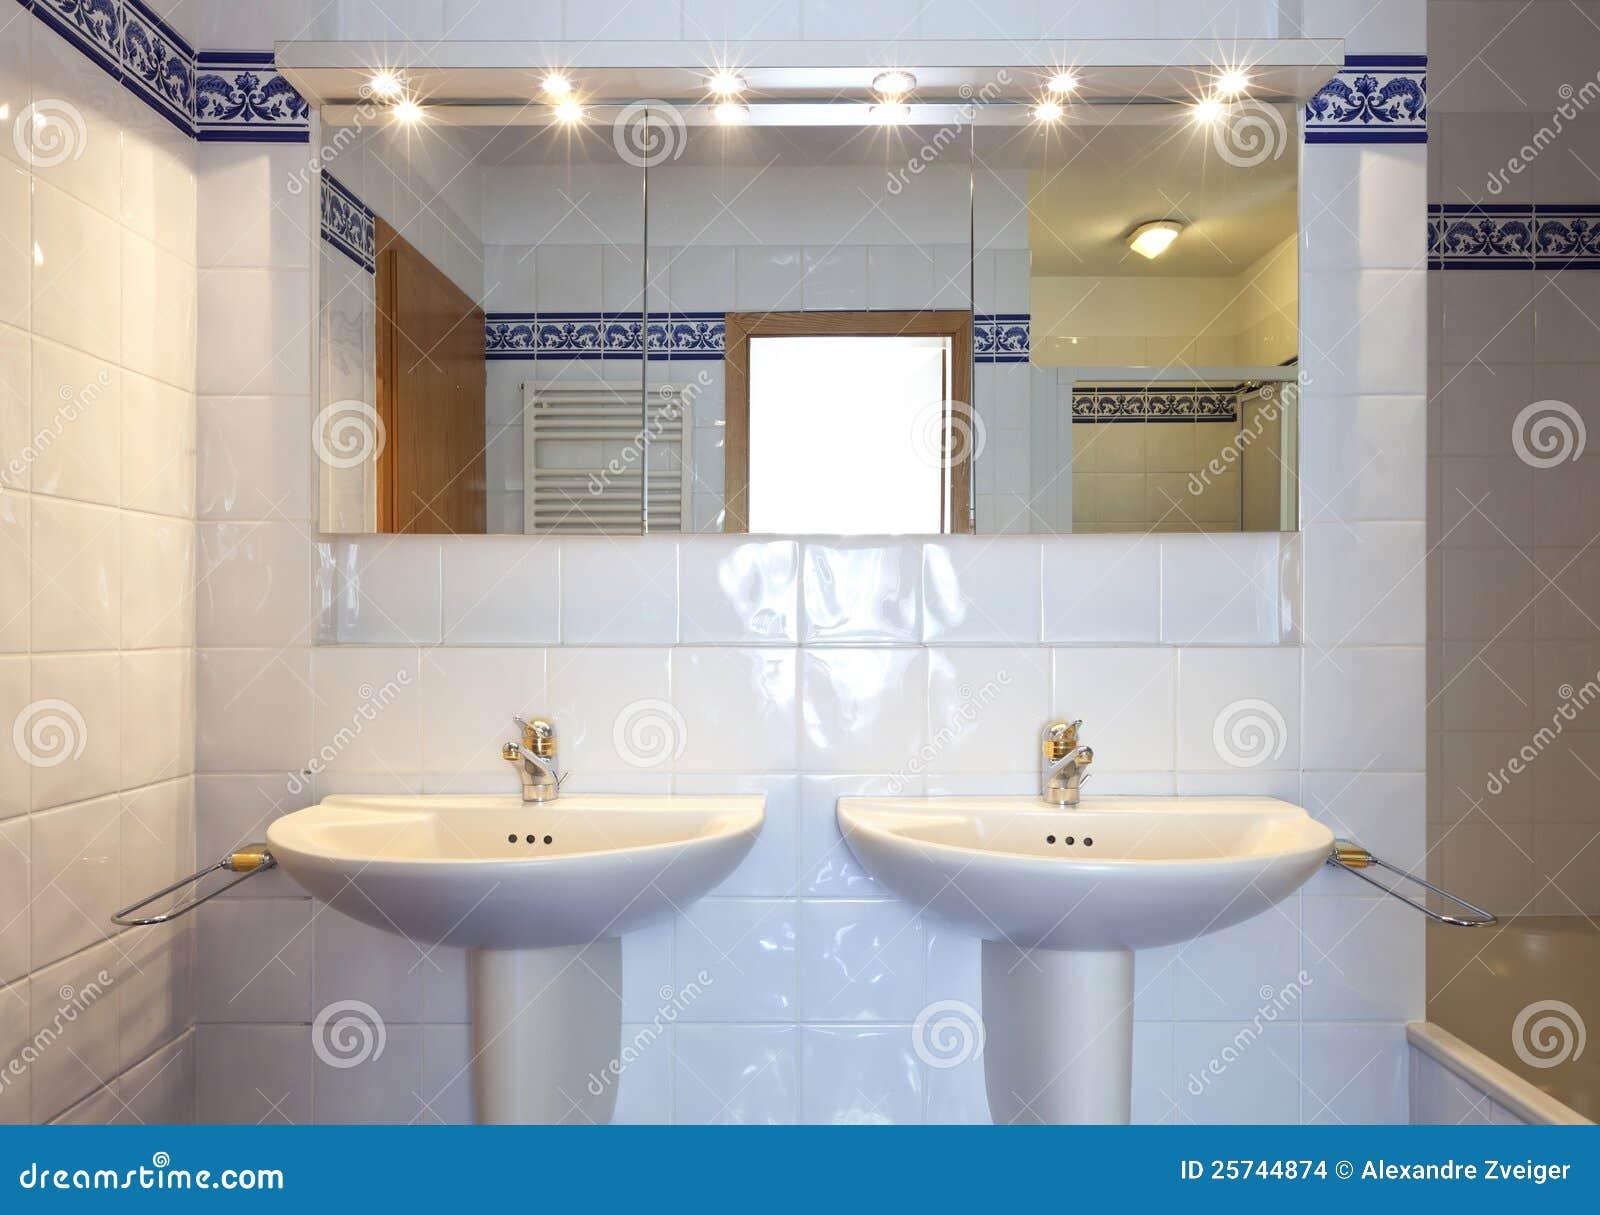 Bathroom Sinks And Mirror Bathroom Sink Mirror NesGamE For